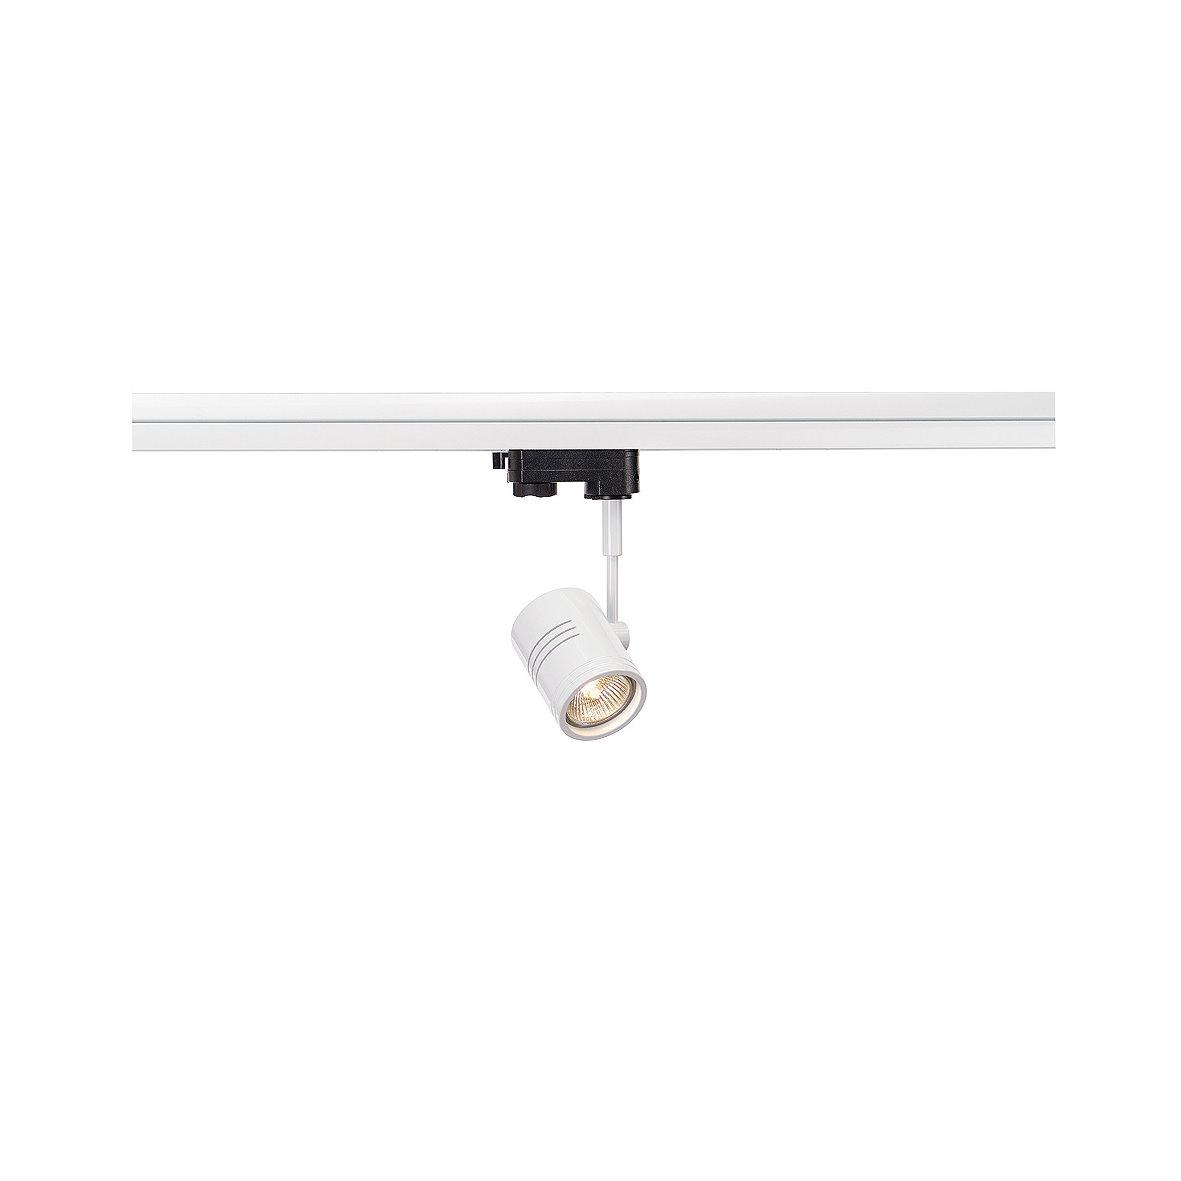 slv 3 phases spot projecteur incl adaptateur clairage. Black Bedroom Furniture Sets. Home Design Ideas